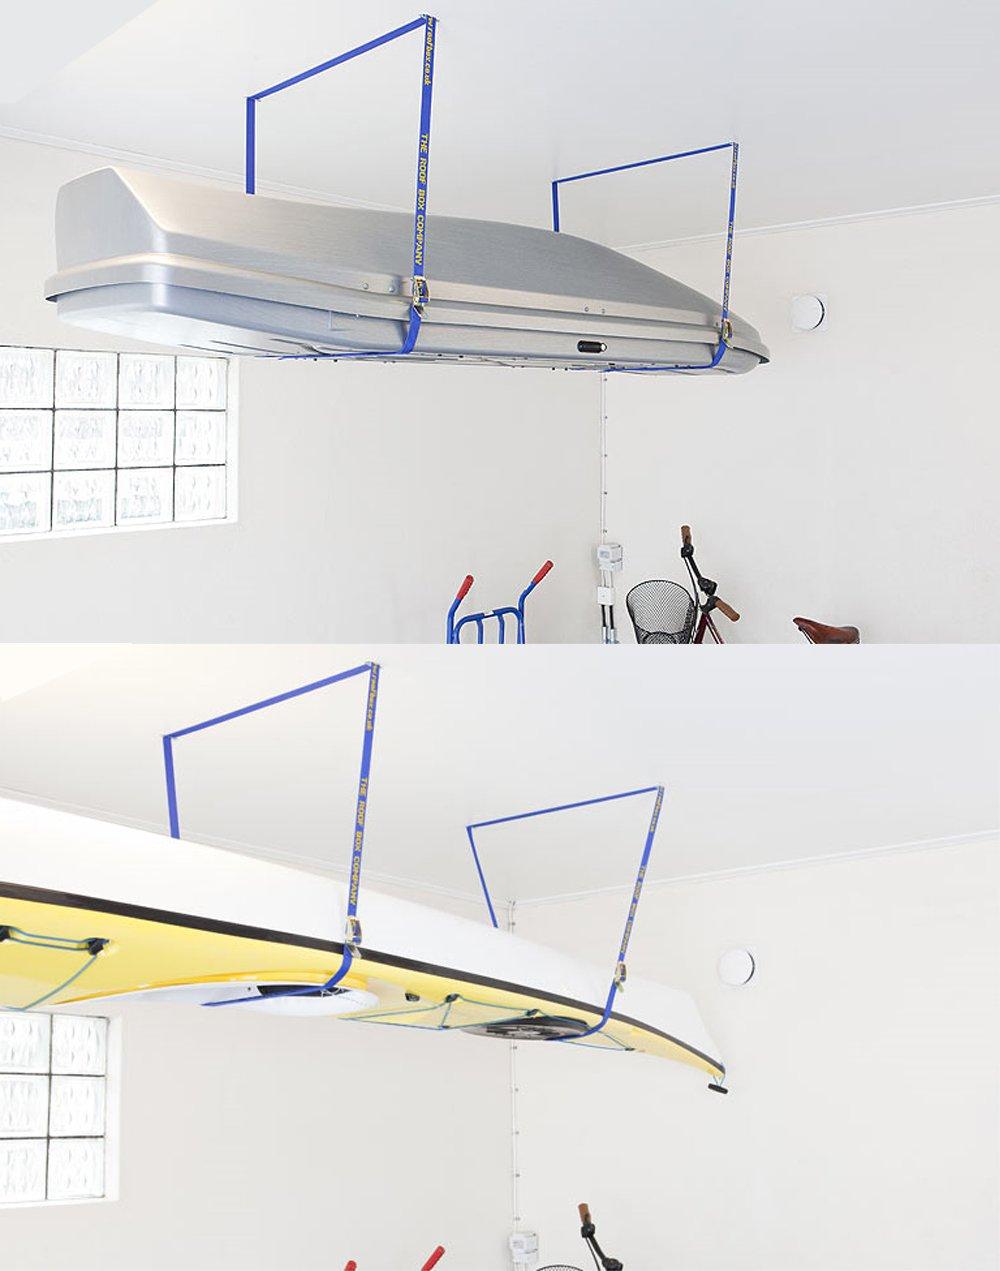 Fasty - Box Lift Straps/Garage Storage Lift/Cargo Lift - 2 Straps - 12' Long, 1'' Wide - OSHA 100 lb - Strength 300 lb